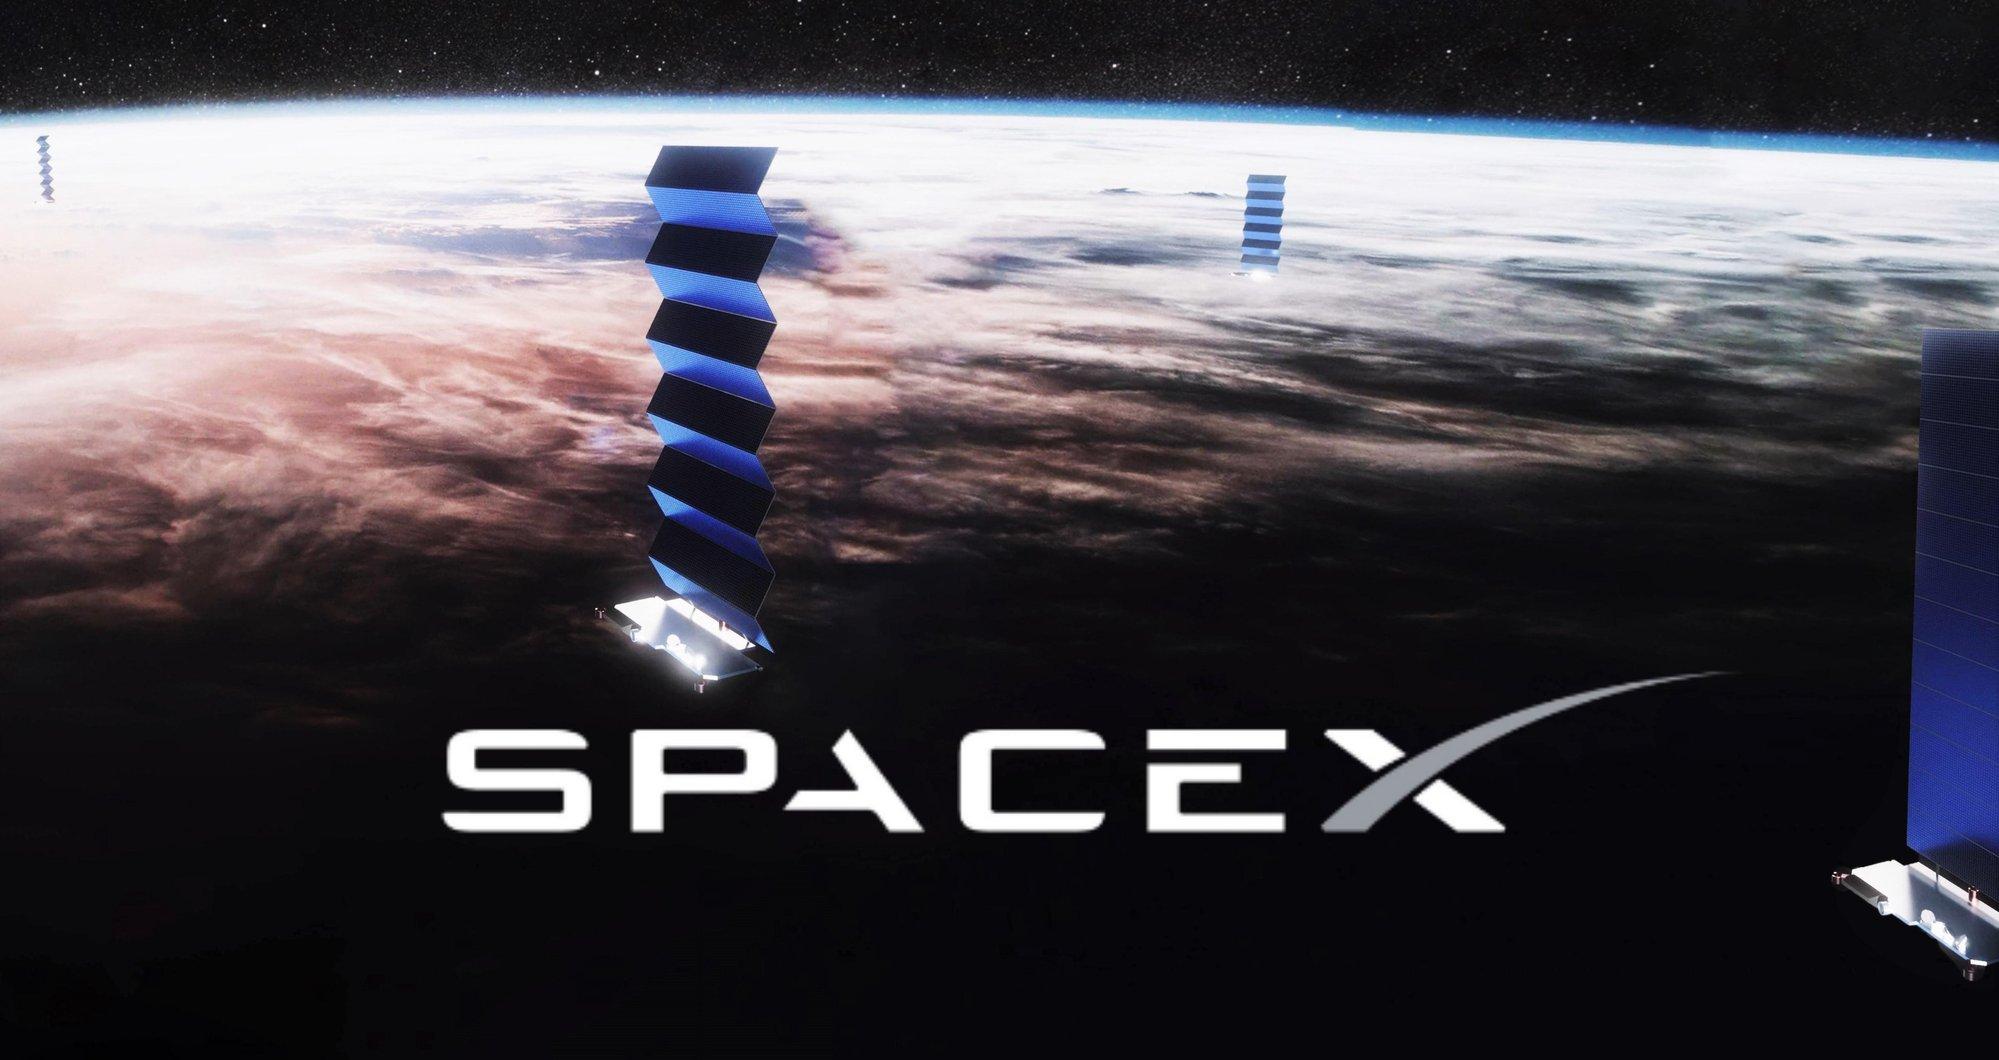 Space X Elon Musk